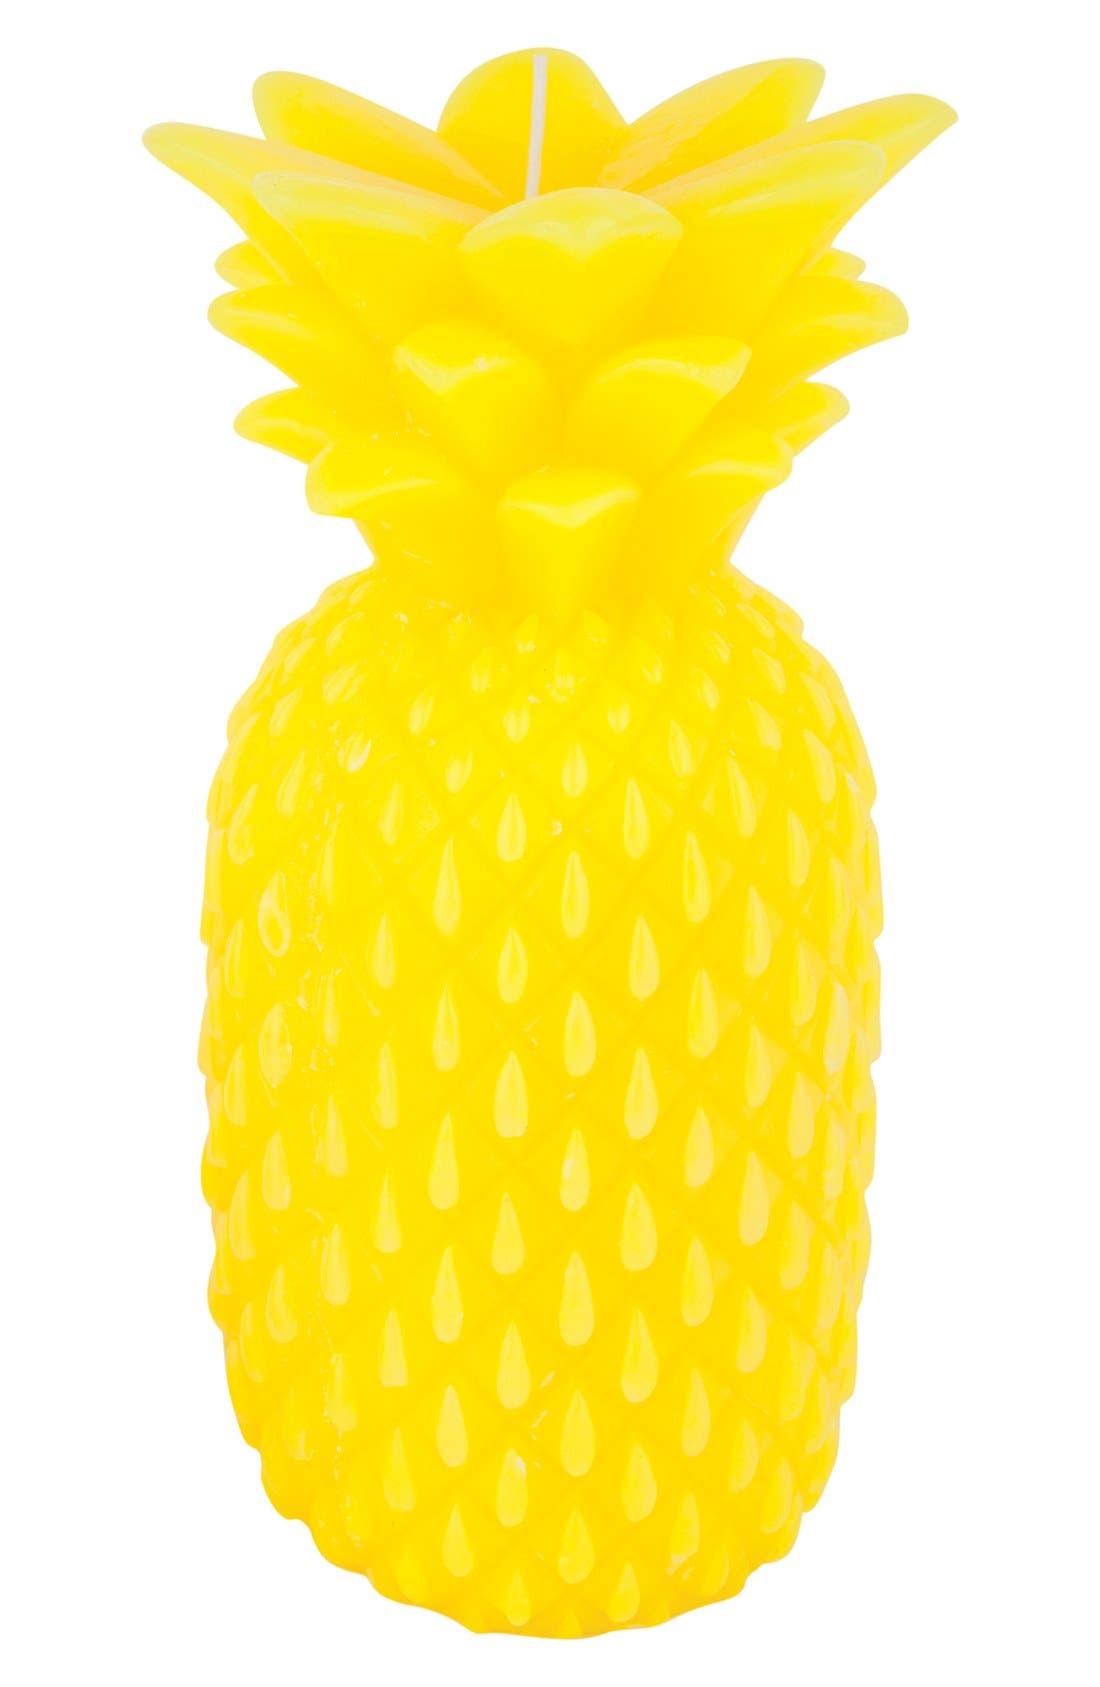 Alternate Image 1 Selected - Sunnylife Pineapple Candle